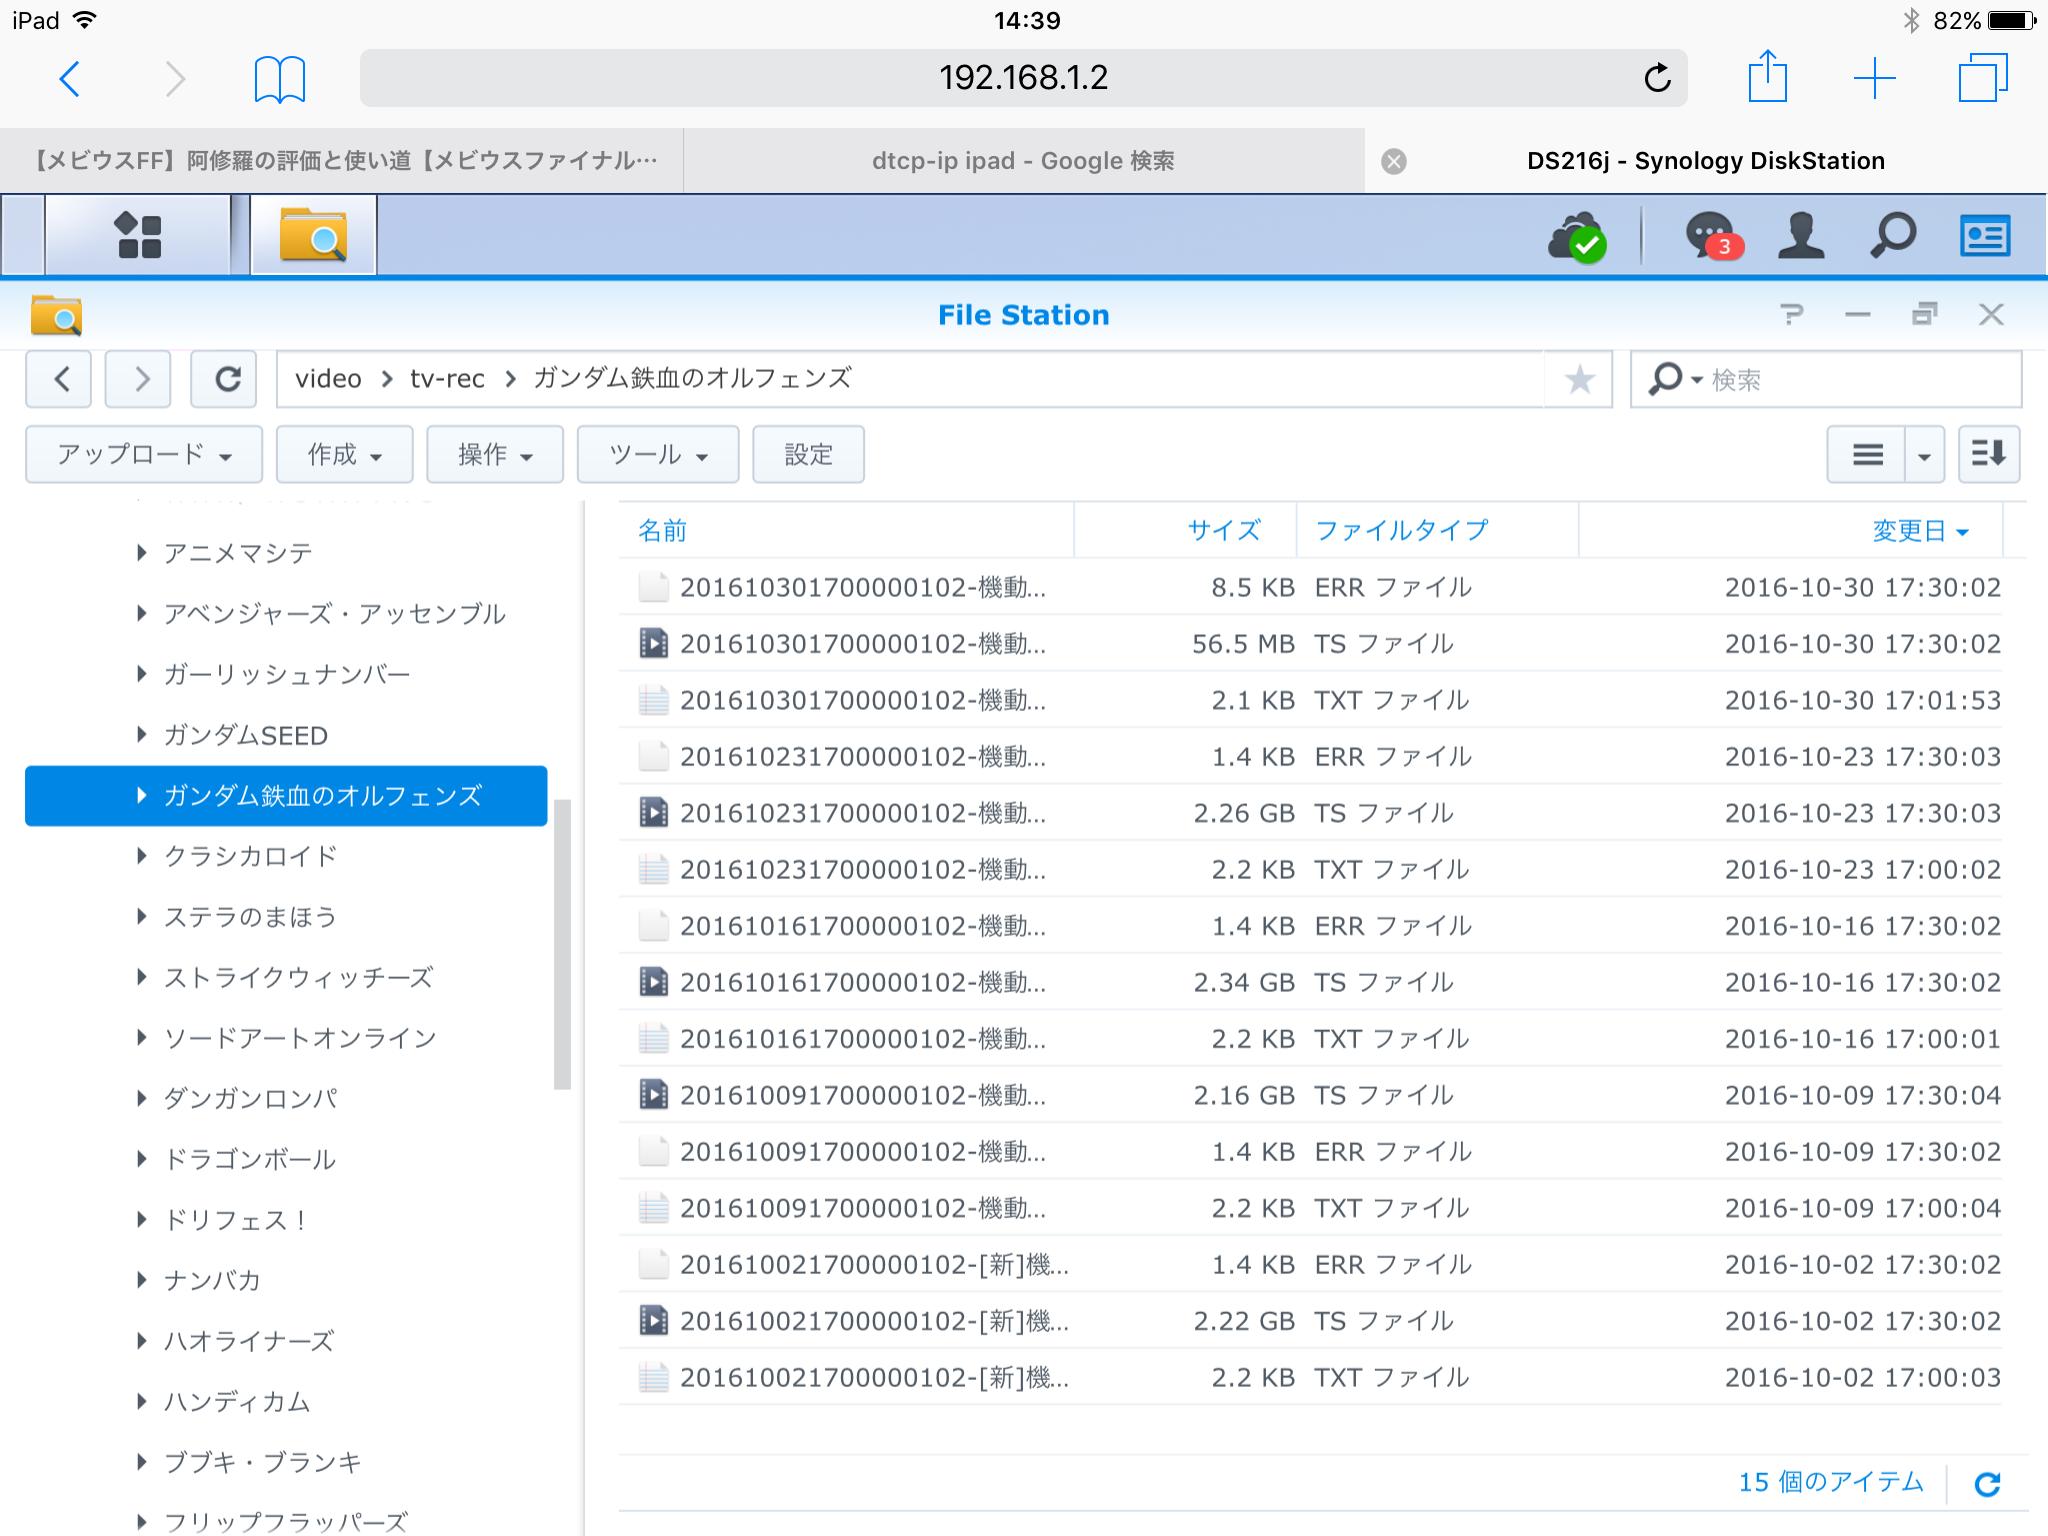 DS216j(Synology)はiPadと連携しても便利。iOSアプリの